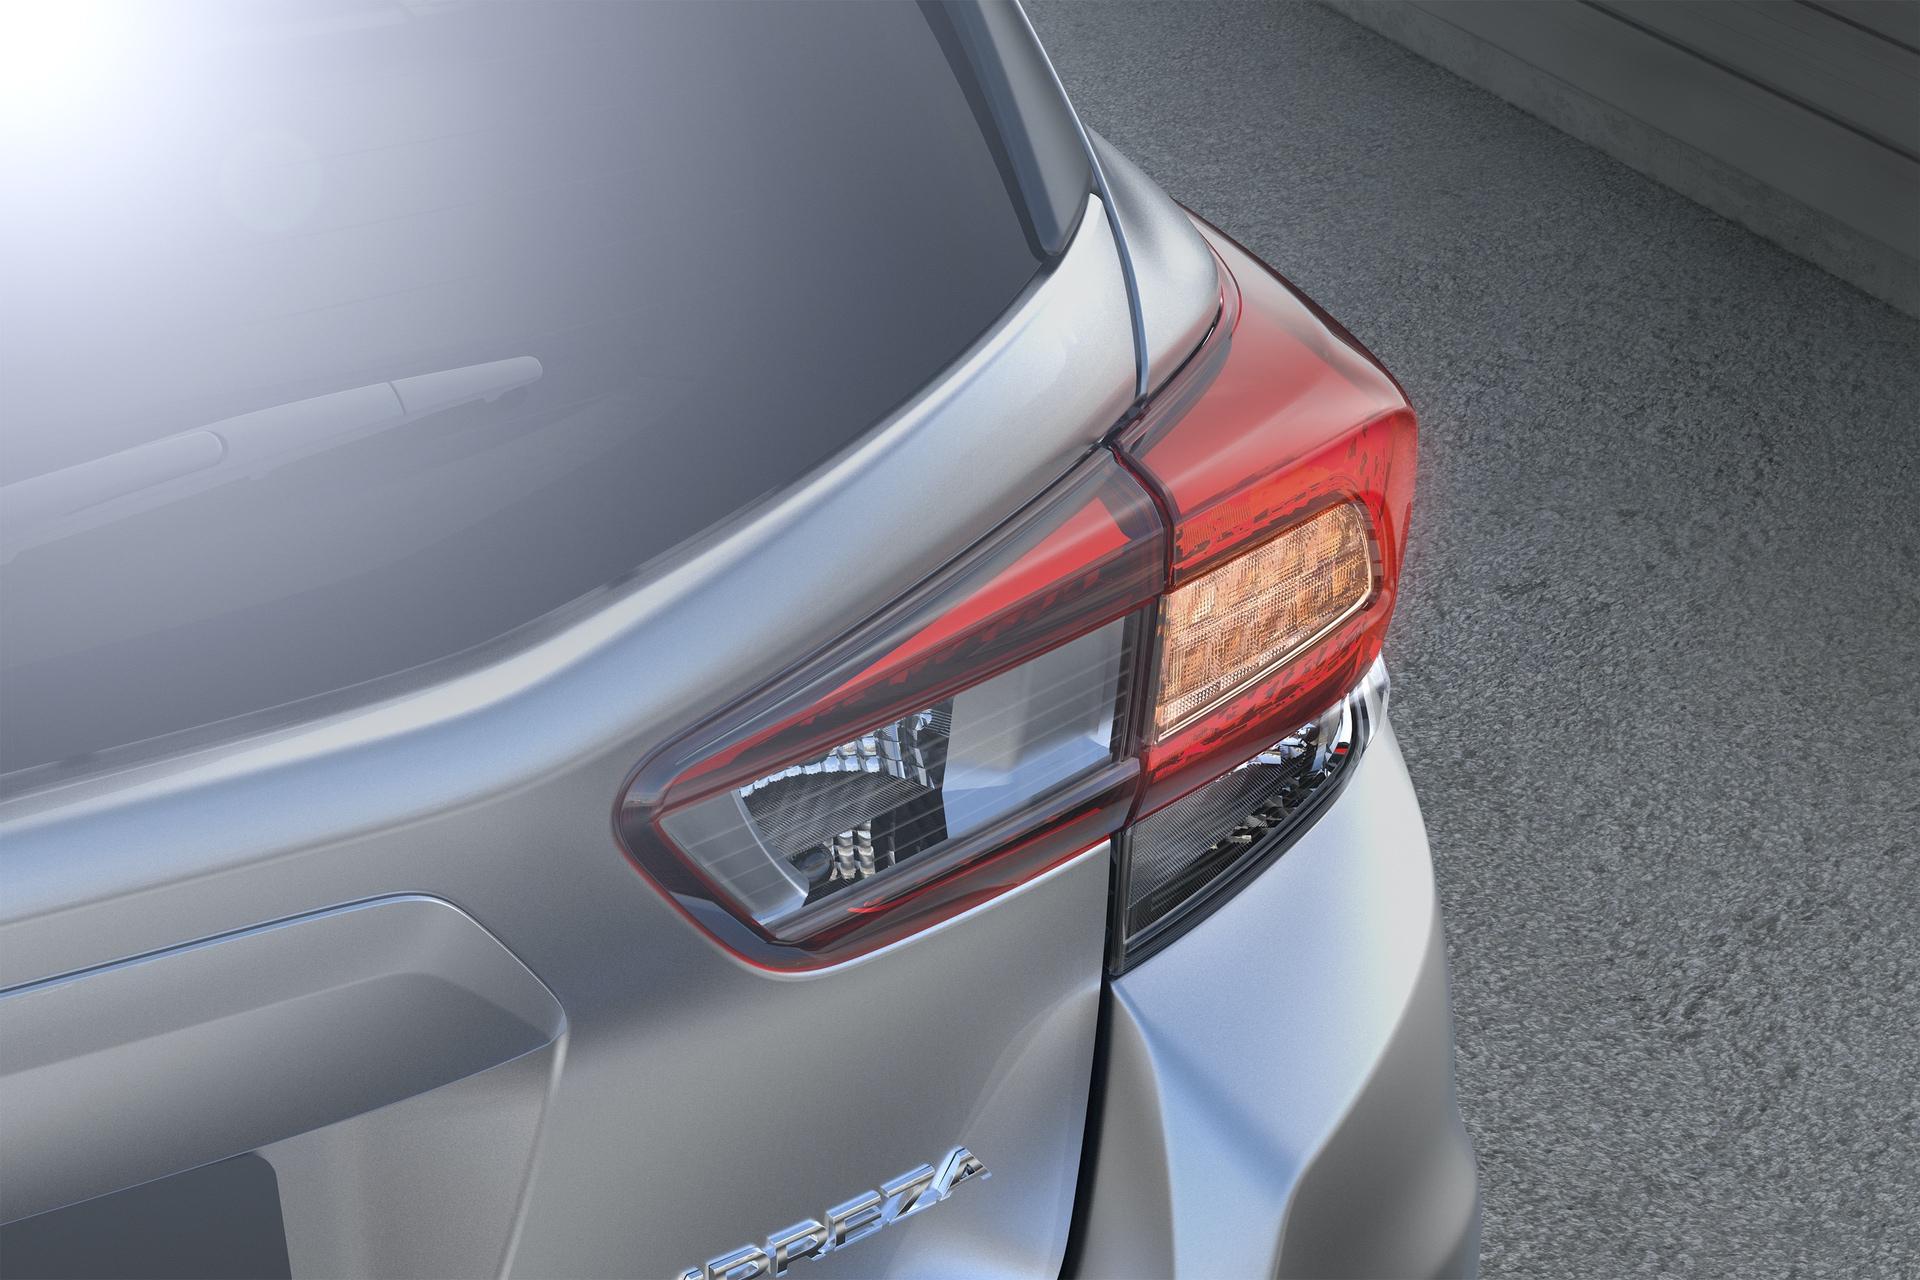 First_Drive_Subaru_Impreza_0025